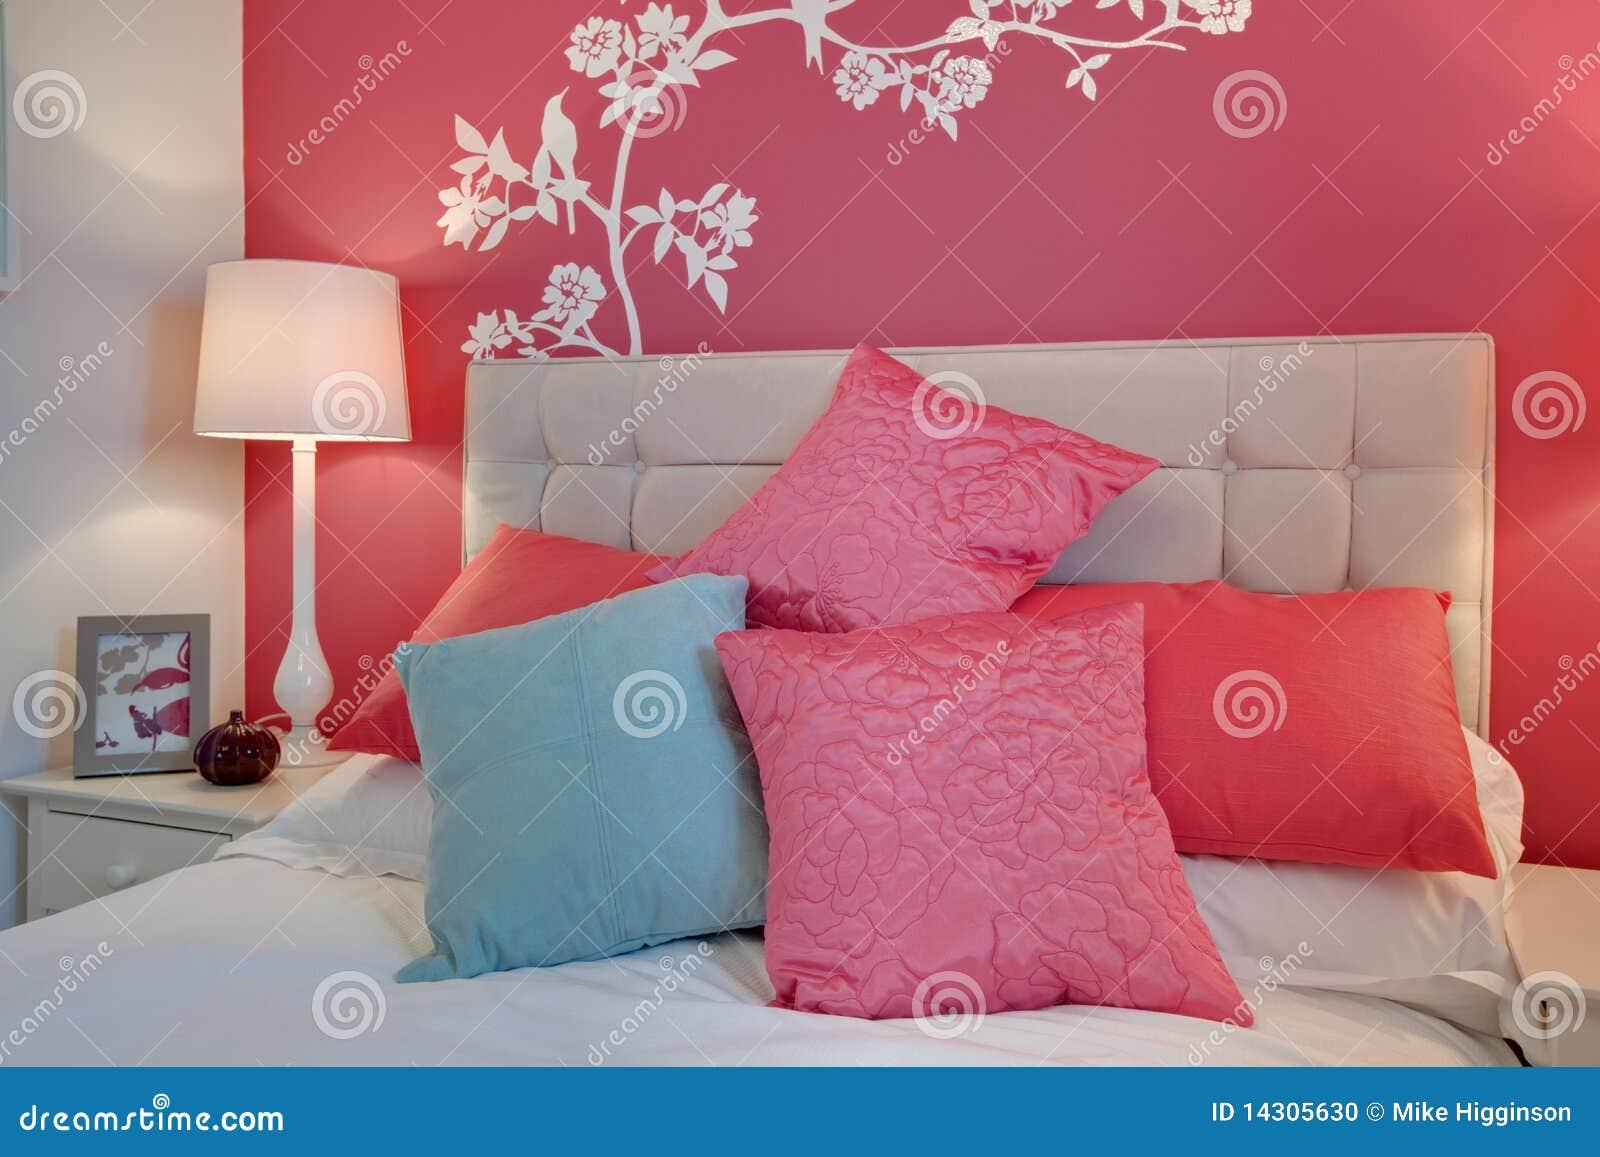 Peinture de chambre coucher peinture idee peinture for Peinture decoration chambre a coucher